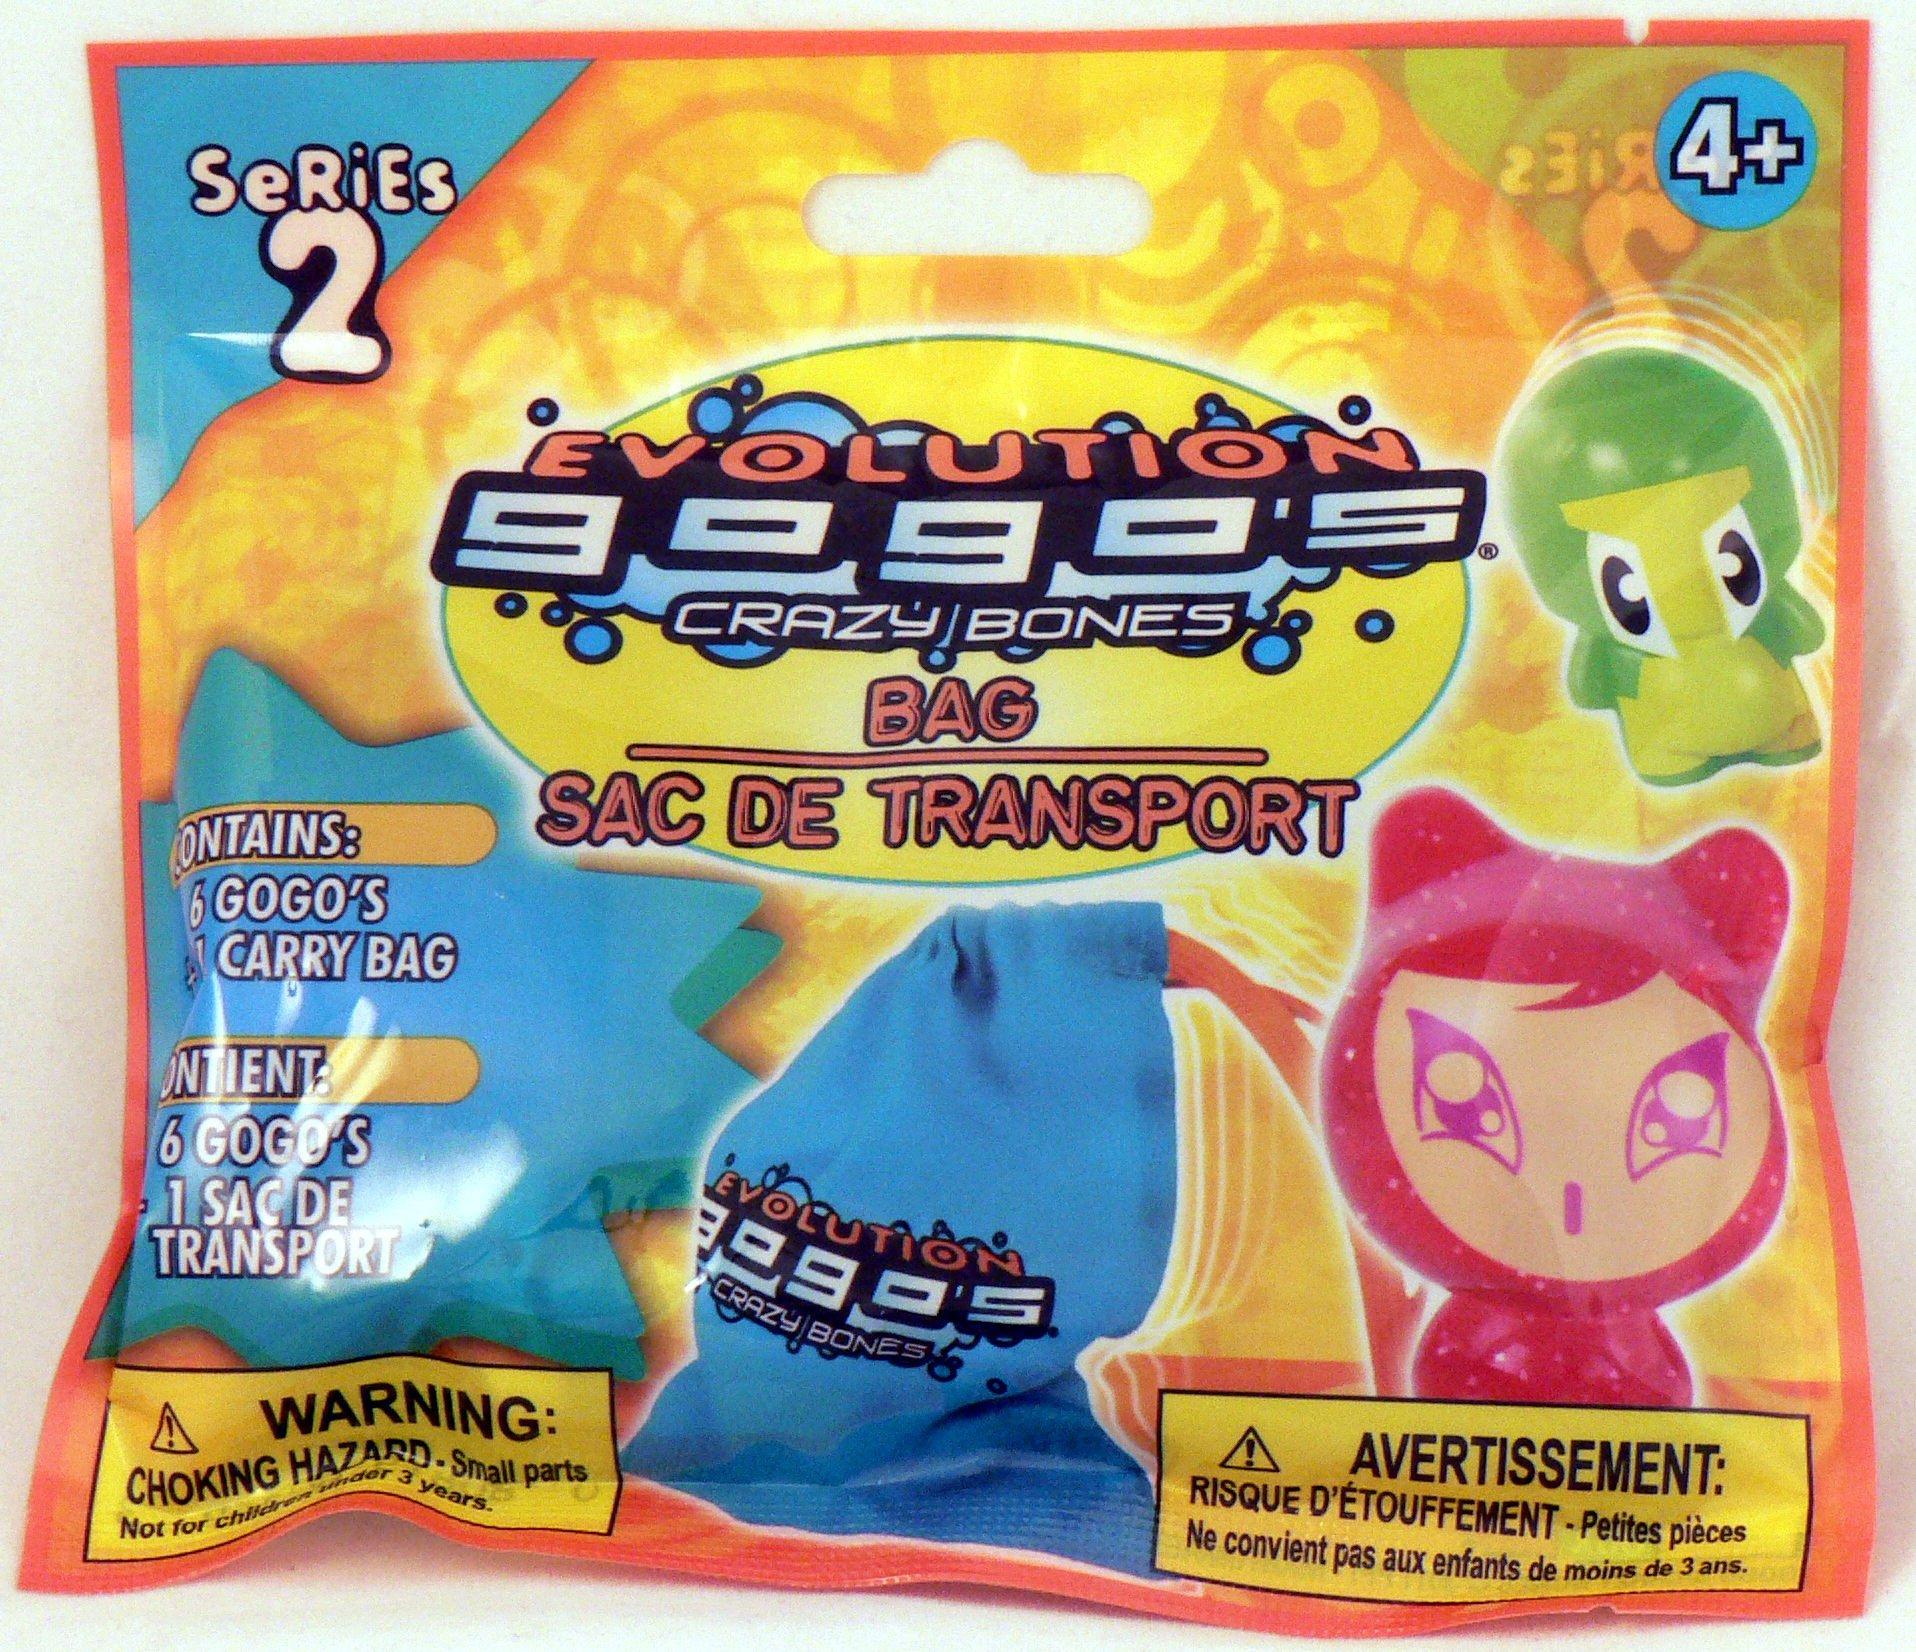 Gogo's Crazy Bones 6-Pack with Carry Bag - Series 2